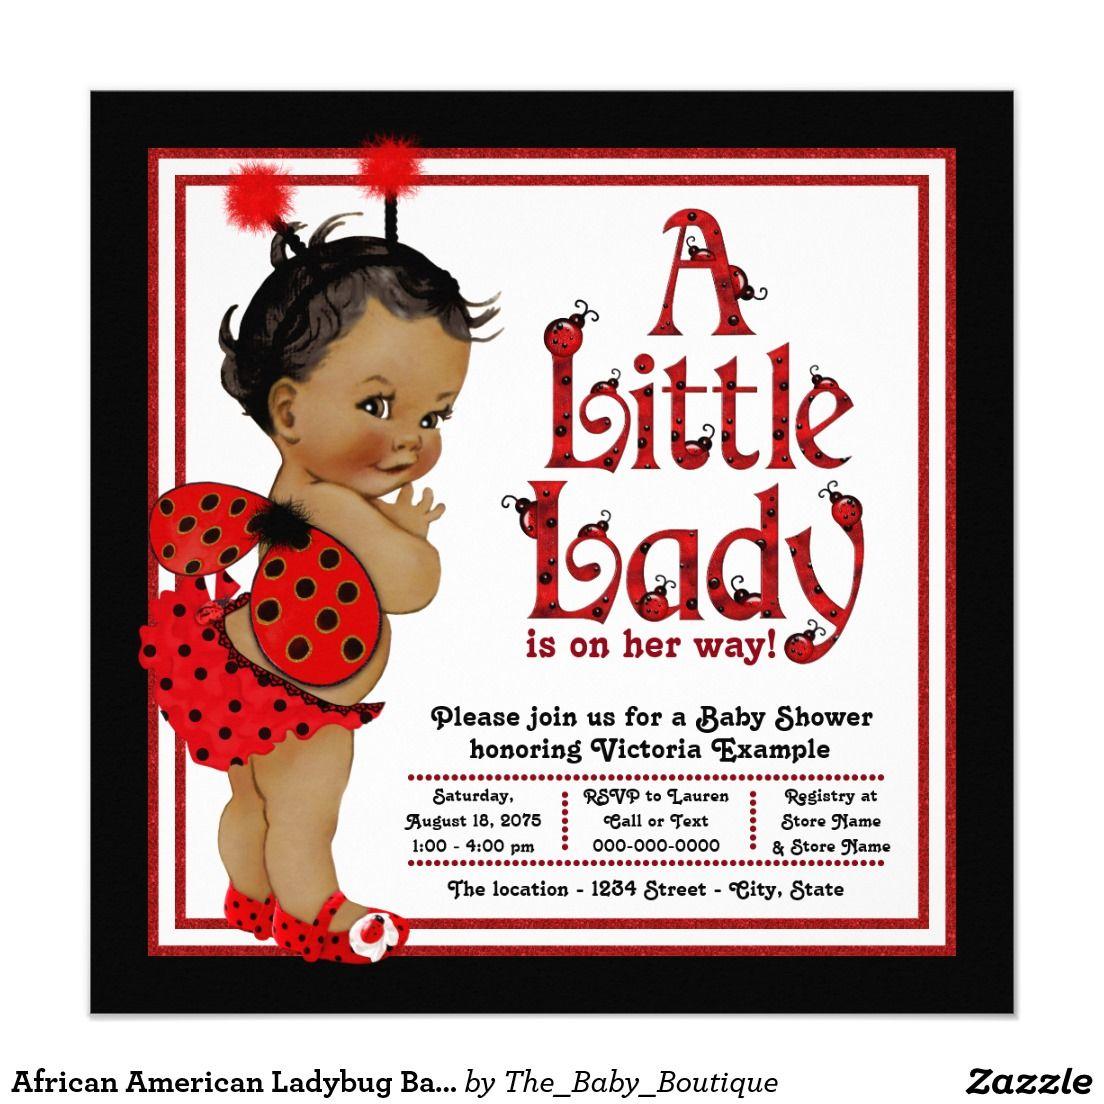 African American Ladybug Baby Shower Invitation | baby shower ...